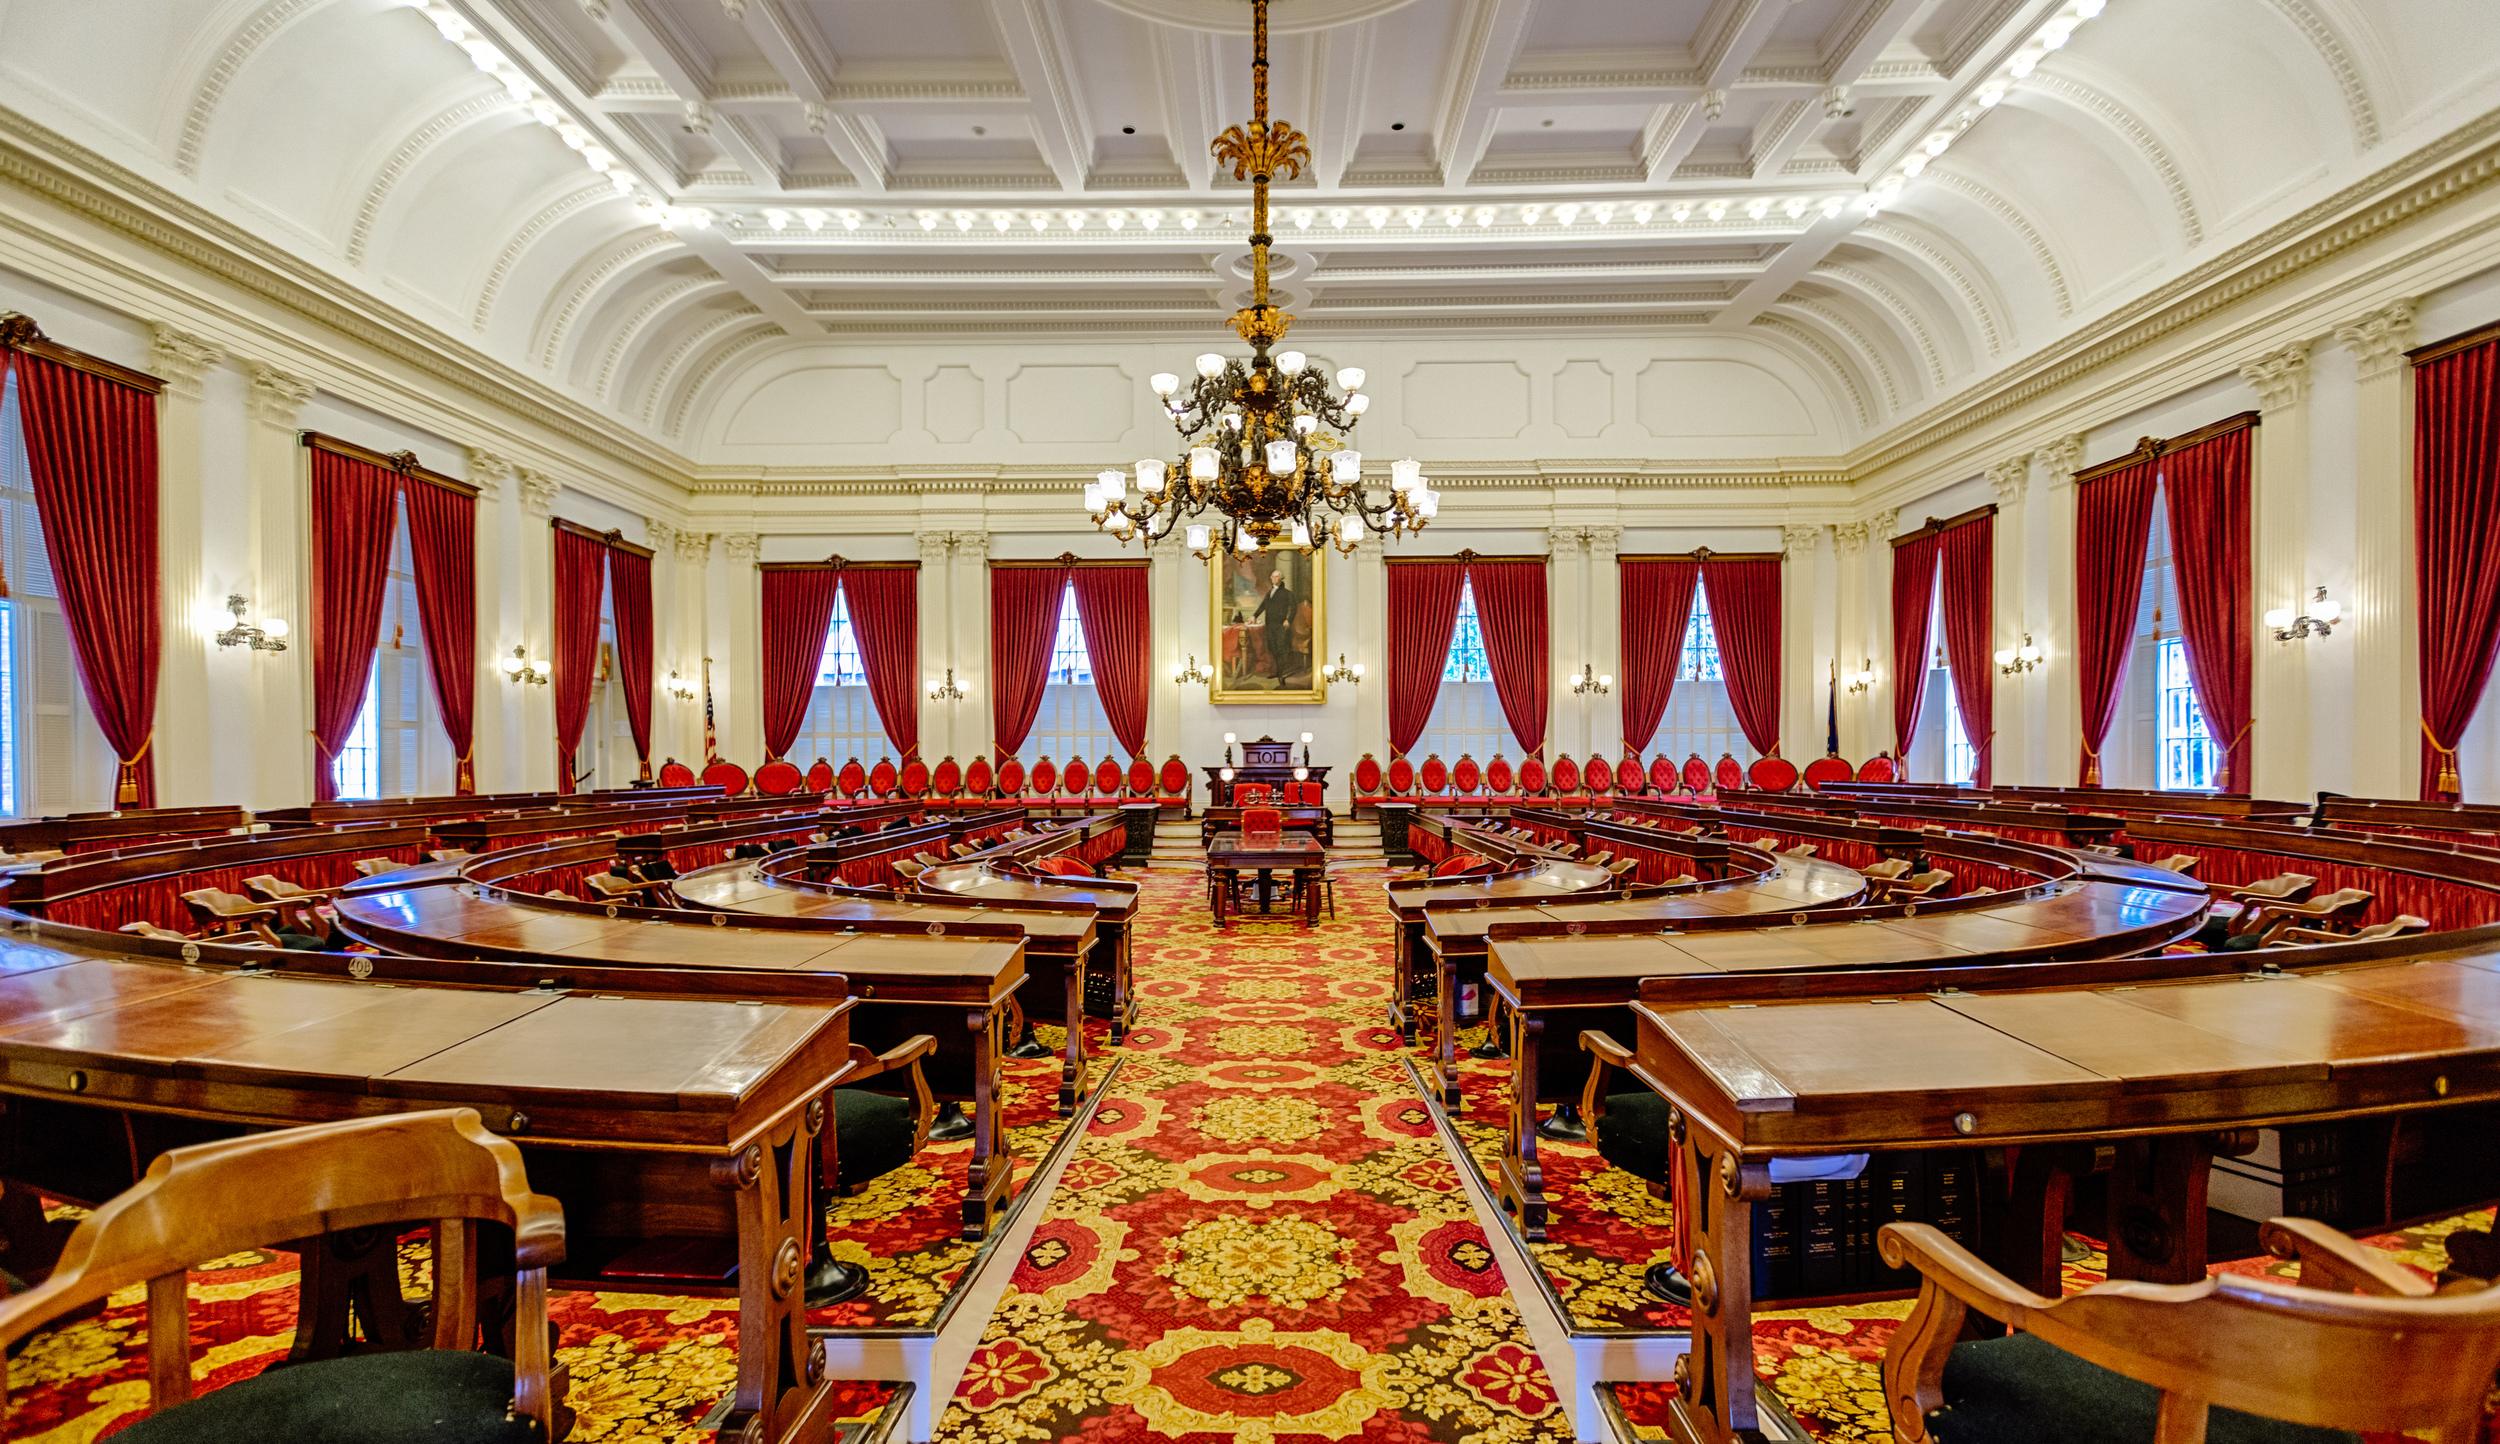 Senate Chamber inside Vermont's State House